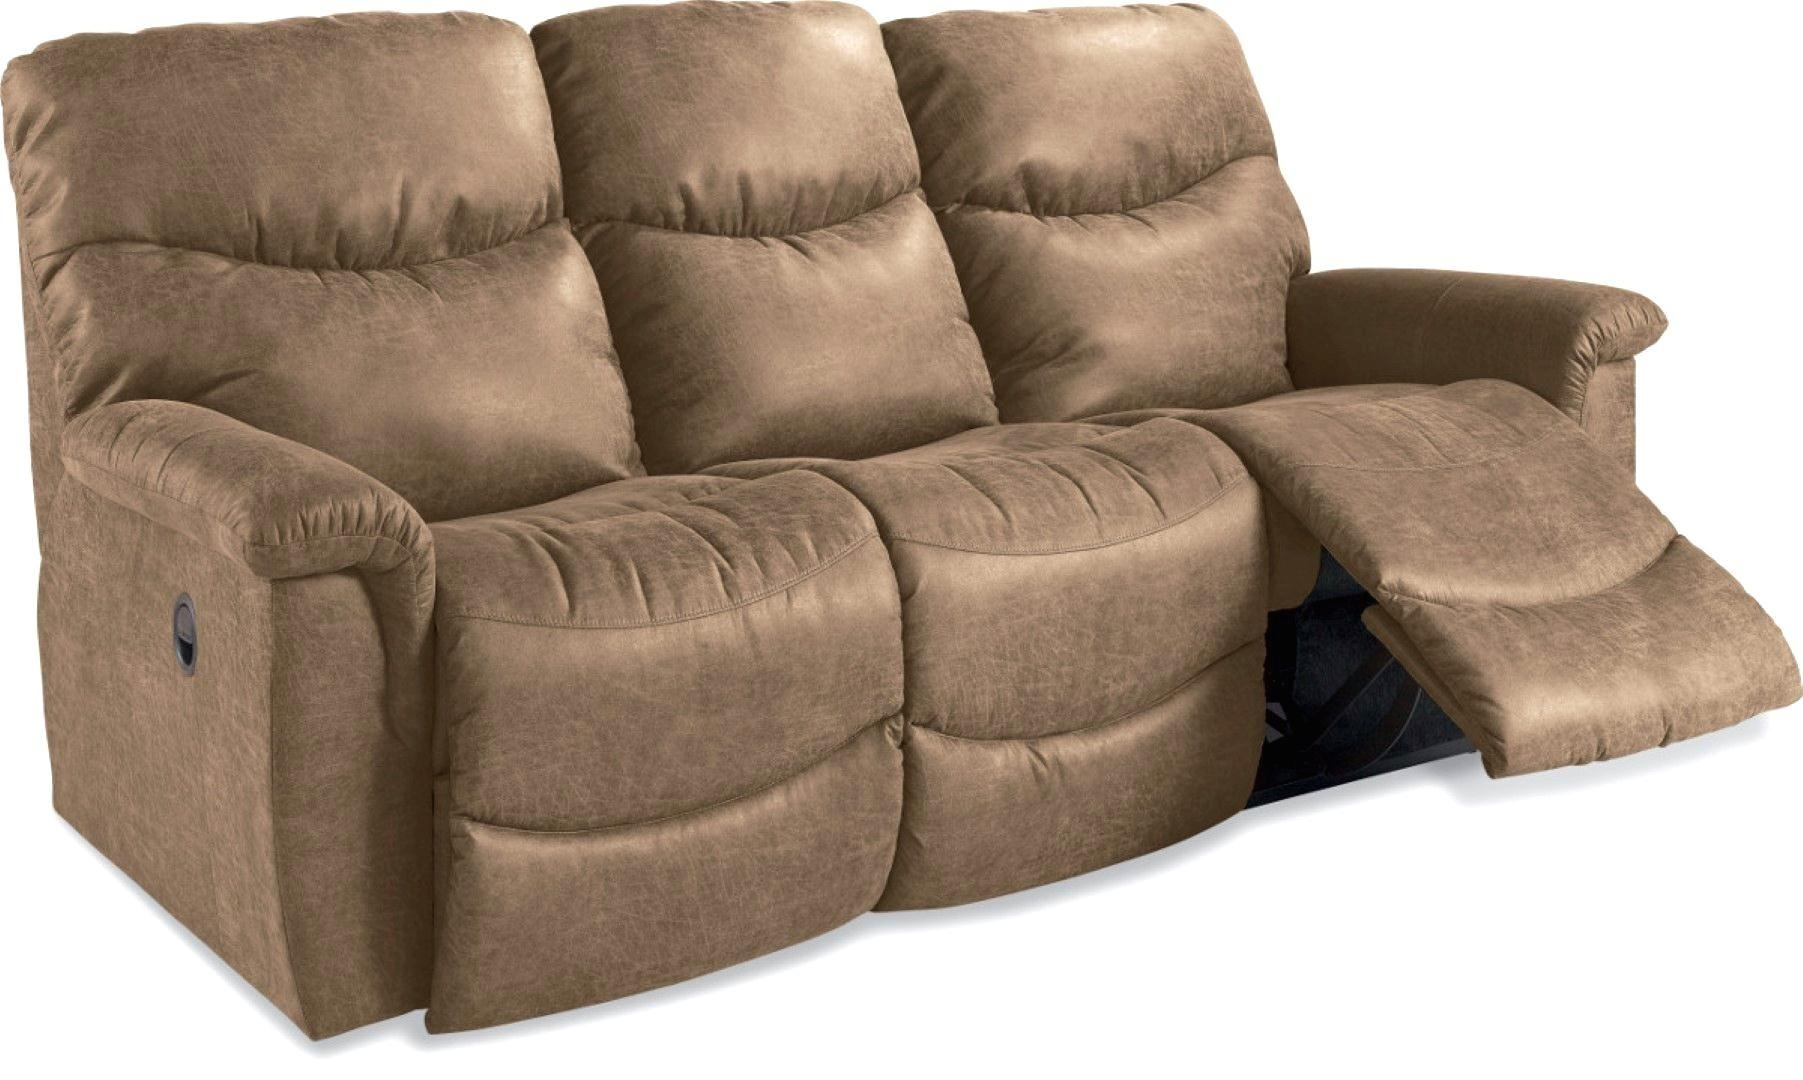 Luxury Lazy Boy Sofa Recliners | Cochabamba Regarding Lazy Boy Manhattan Sofas (View 8 of 21)